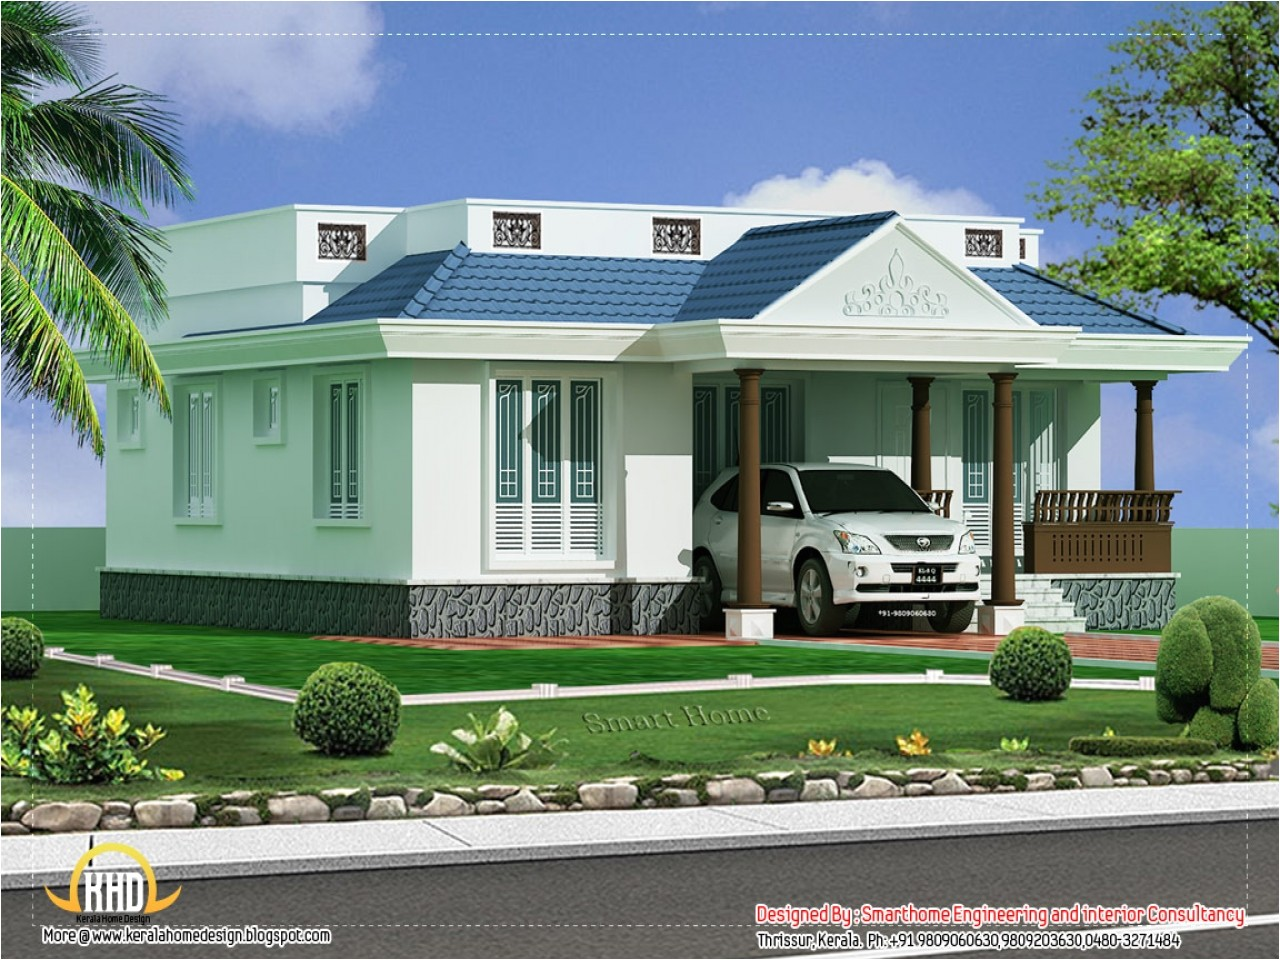 f729c030a281eab1 single story brick house kerala single story house plans